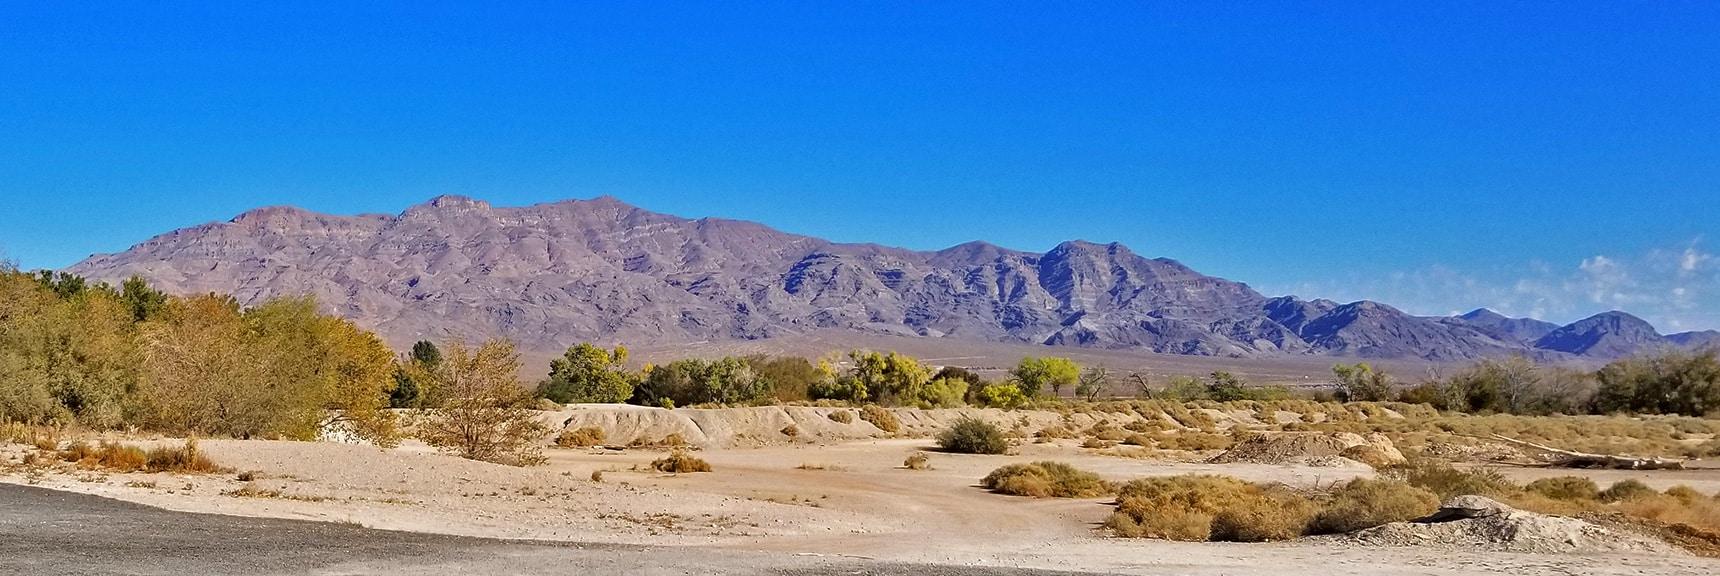 Gass Peak Viewed from South of Floyd Lamb Park   Centennial Hills Mountain Bike Conditioning Adventure Loop, Las Vegas, Nevada